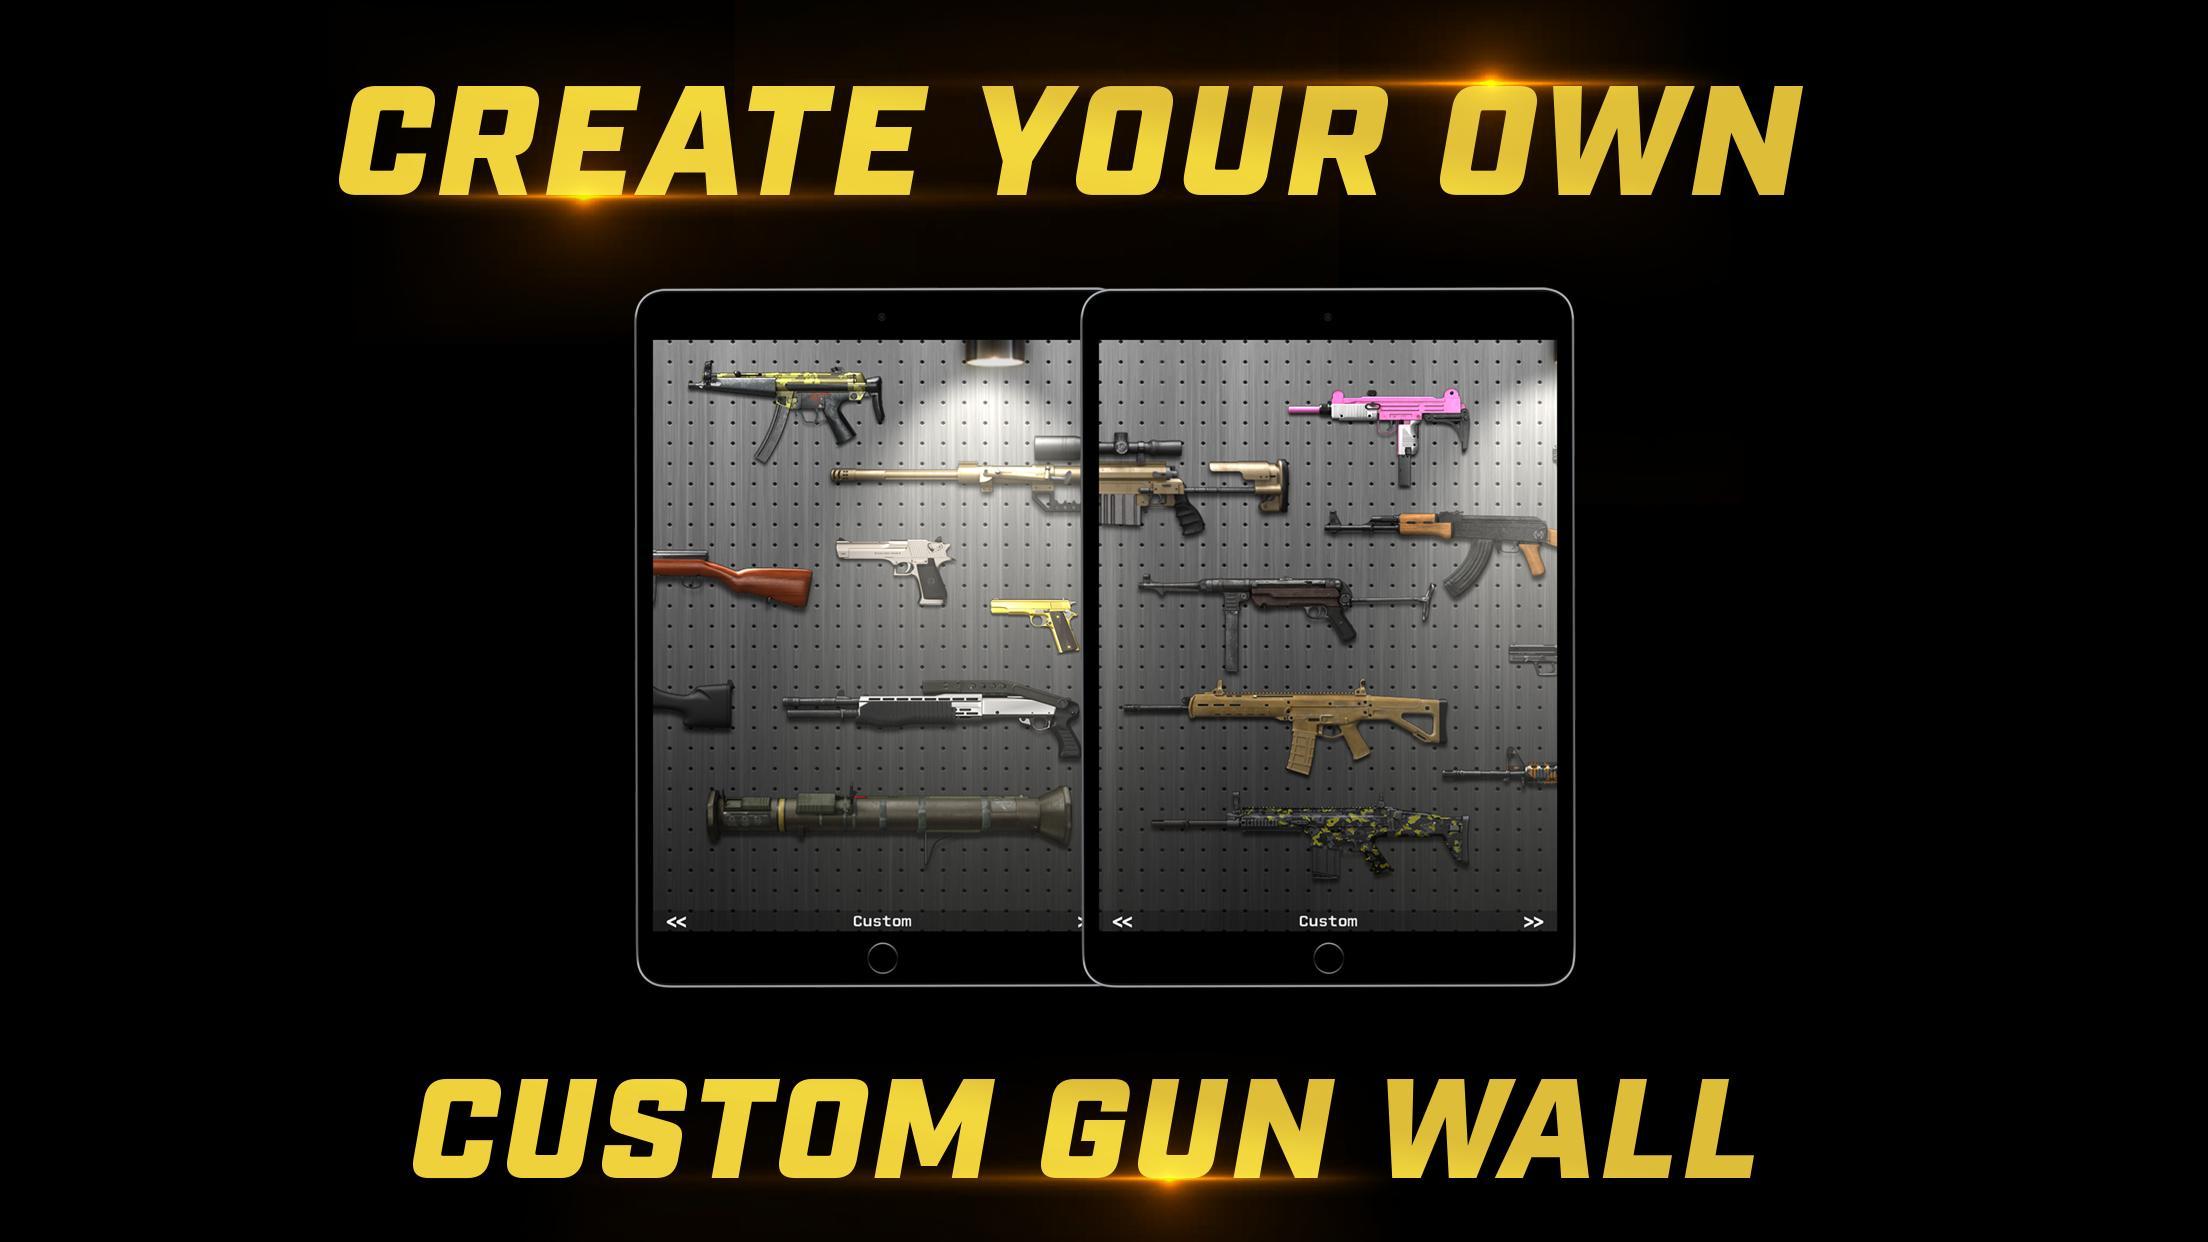 iGun Pro The Original Gun App 5.26 Screenshot 5